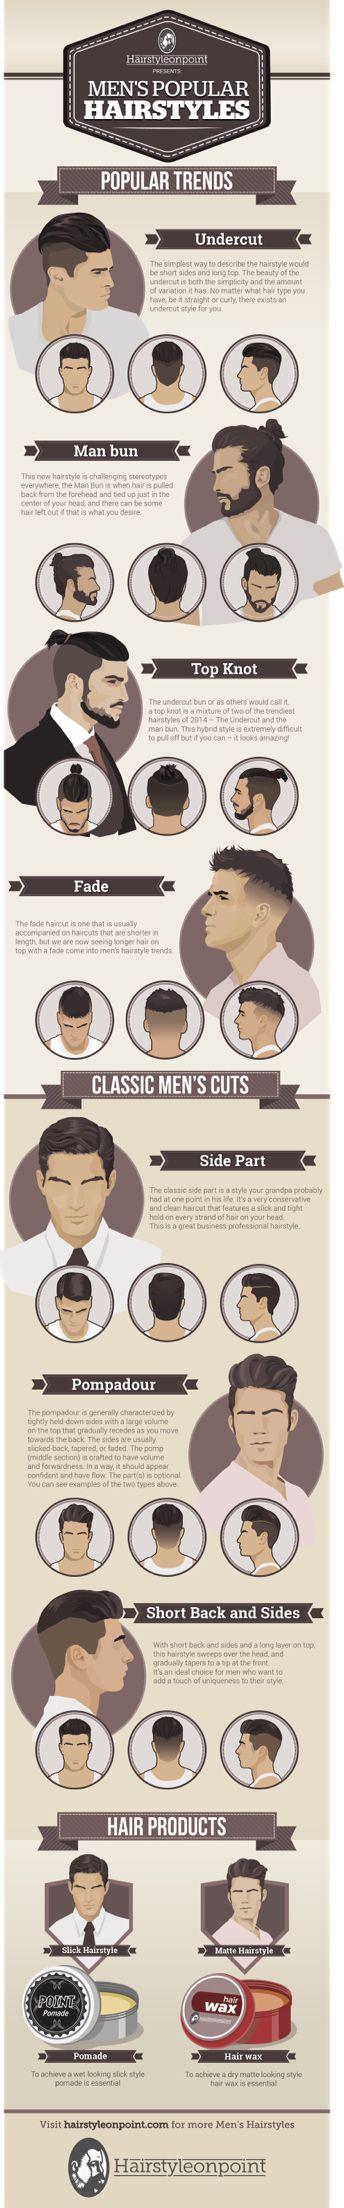 Popular hairstyles for men.  #DreamBeard      dreambeard.com